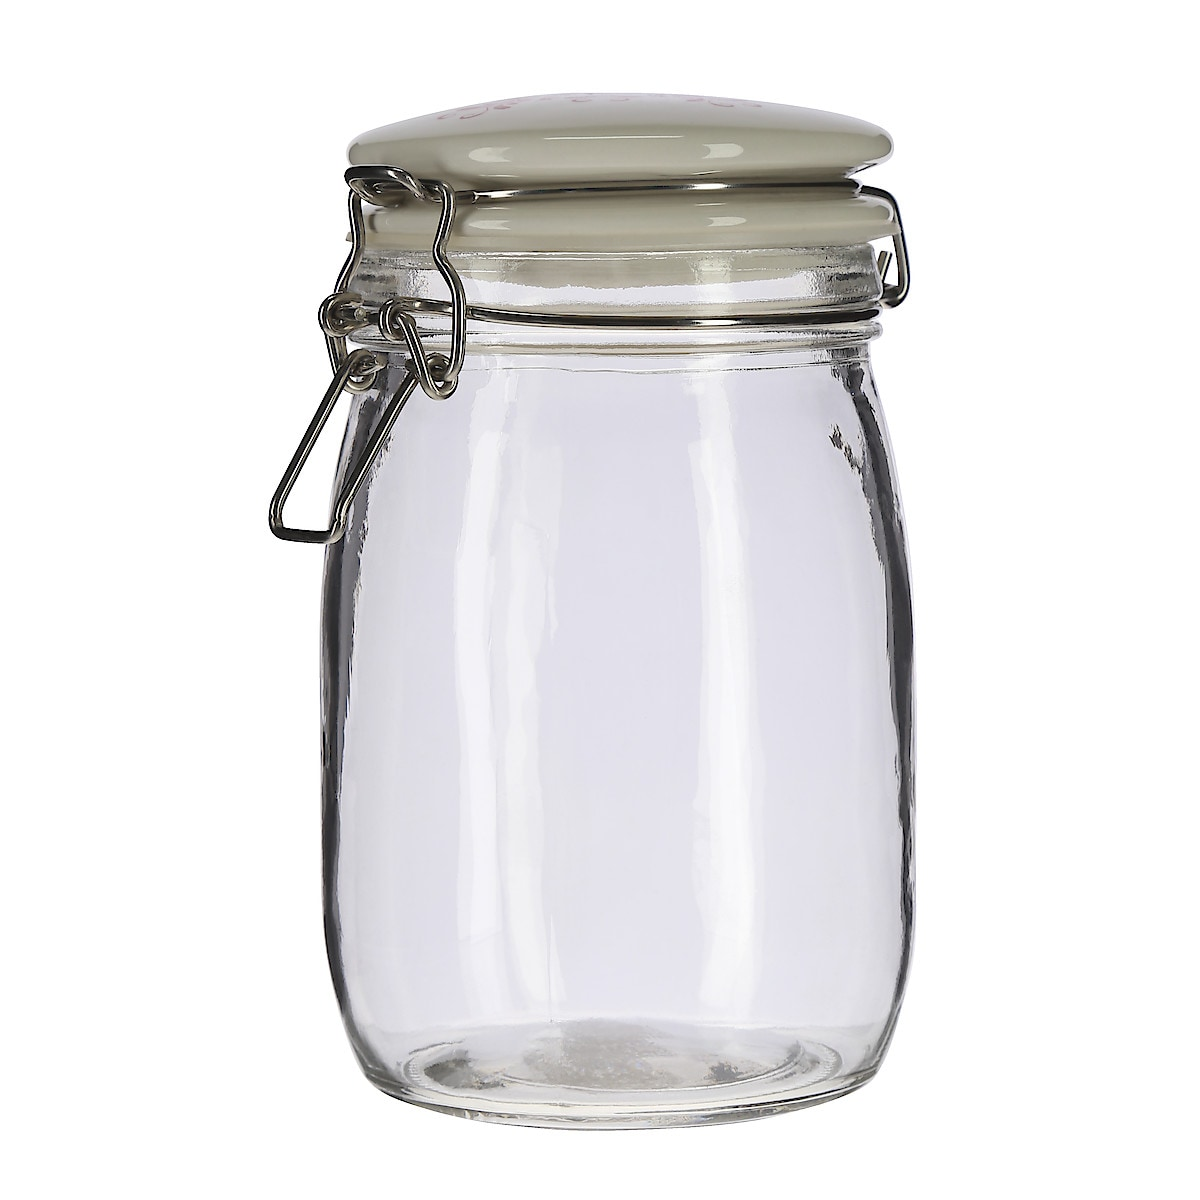 Folklore Glass Jar with Ceramic Lid